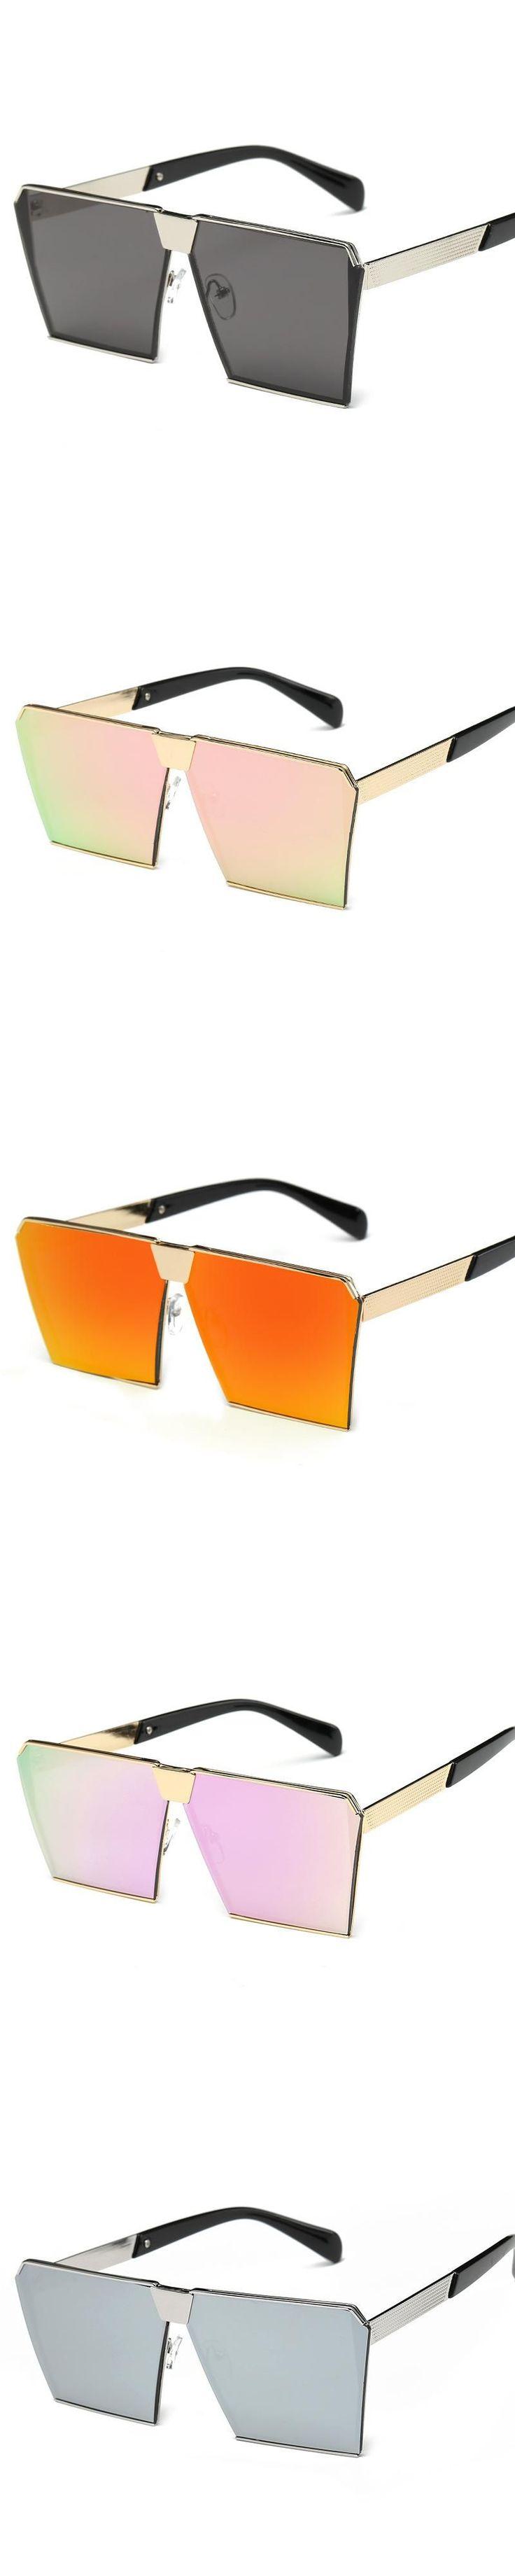 wholesale  Brand Designer Sunglasses Women Men Hip Hop Sun Glasses Big Size Oversize Lady Fashion Hipster Flat Top Eyeglasses